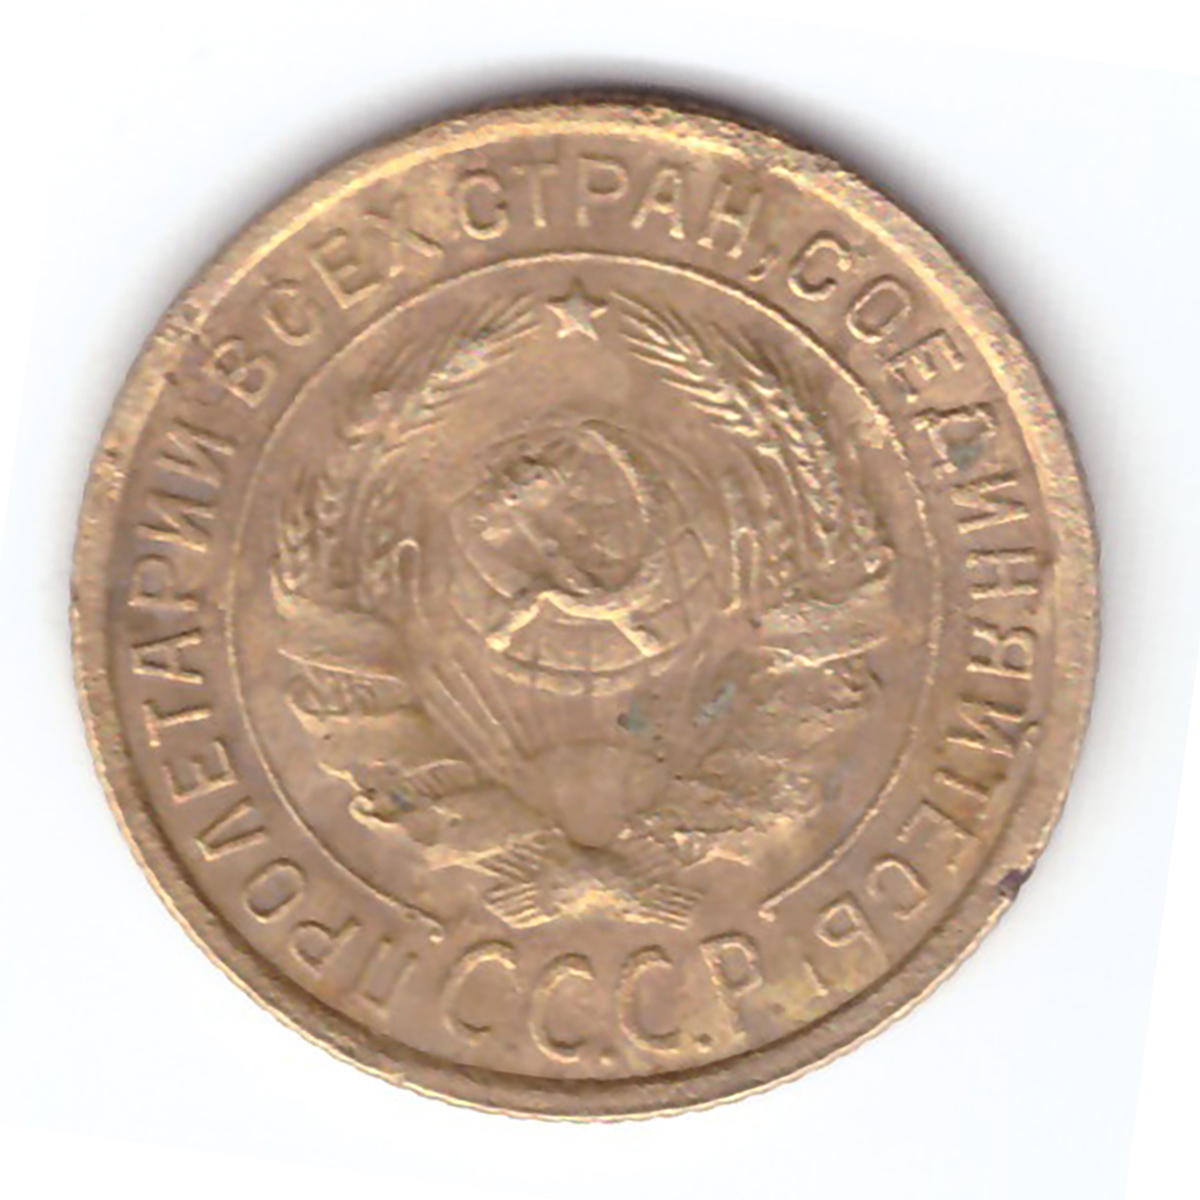 2 копейки 1934 года. F